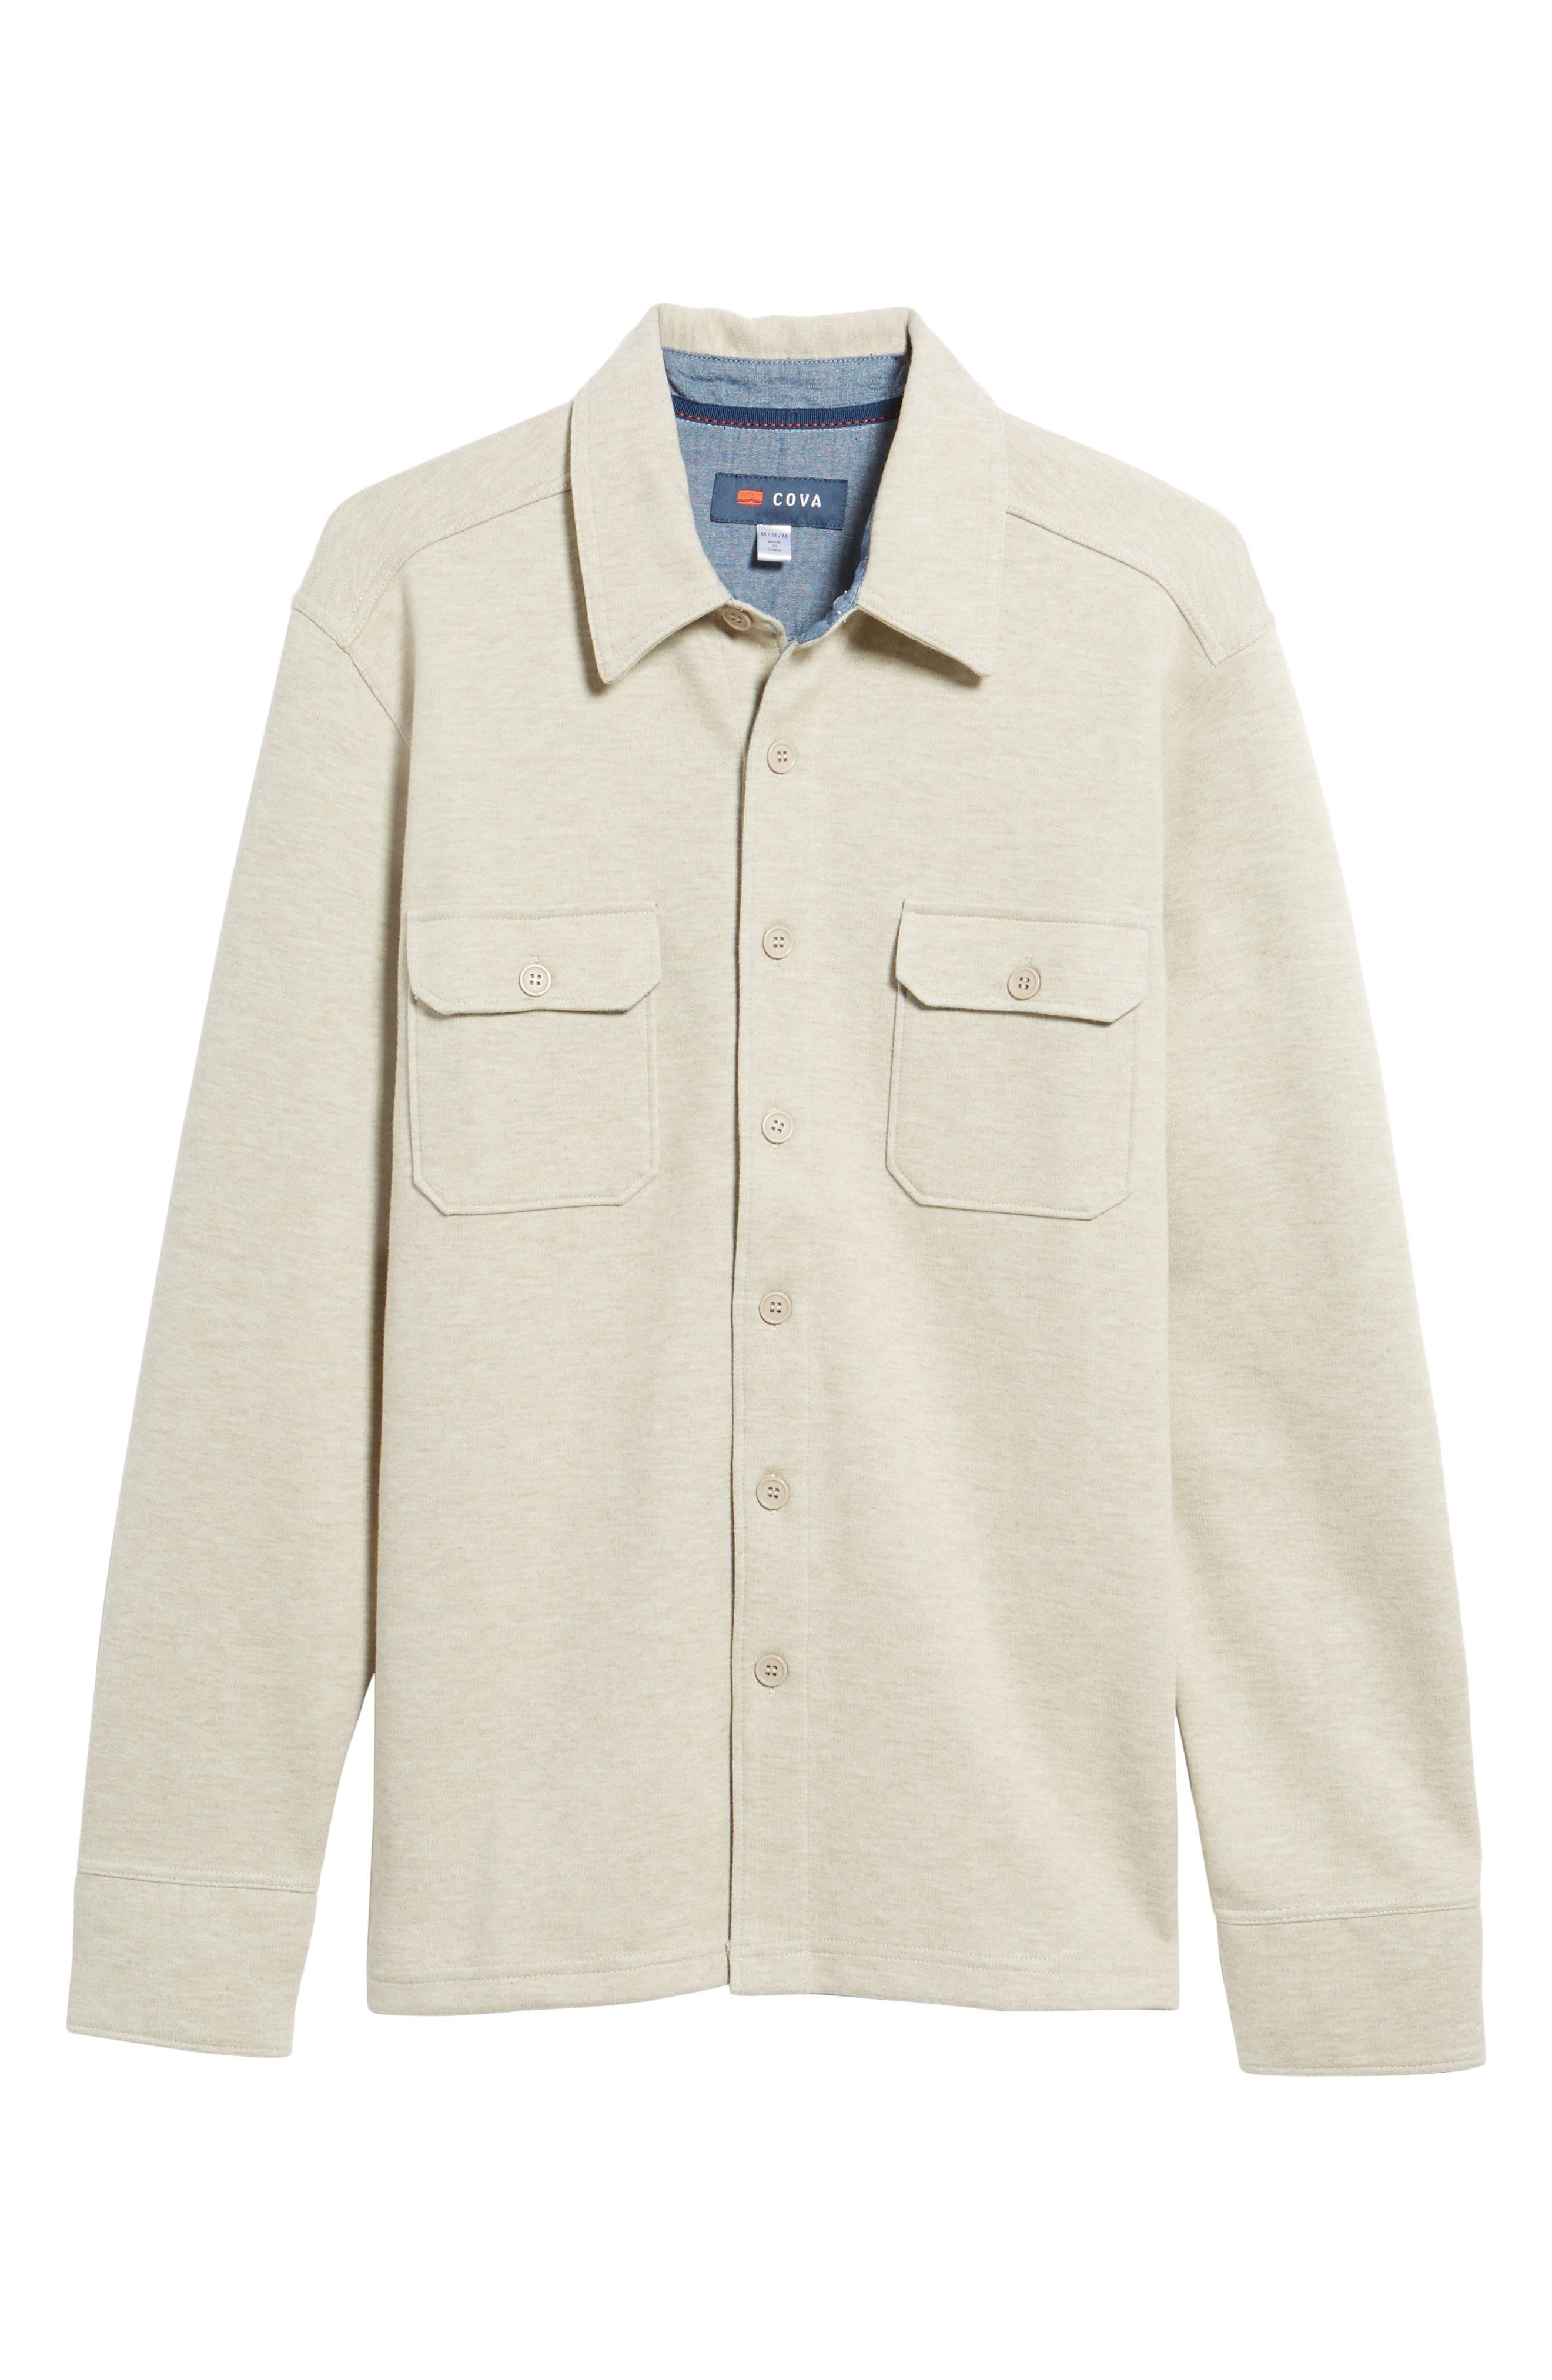 'Longitude' Flap Pocket Fleece Shirt,                             Alternate thumbnail 6, color,                             202